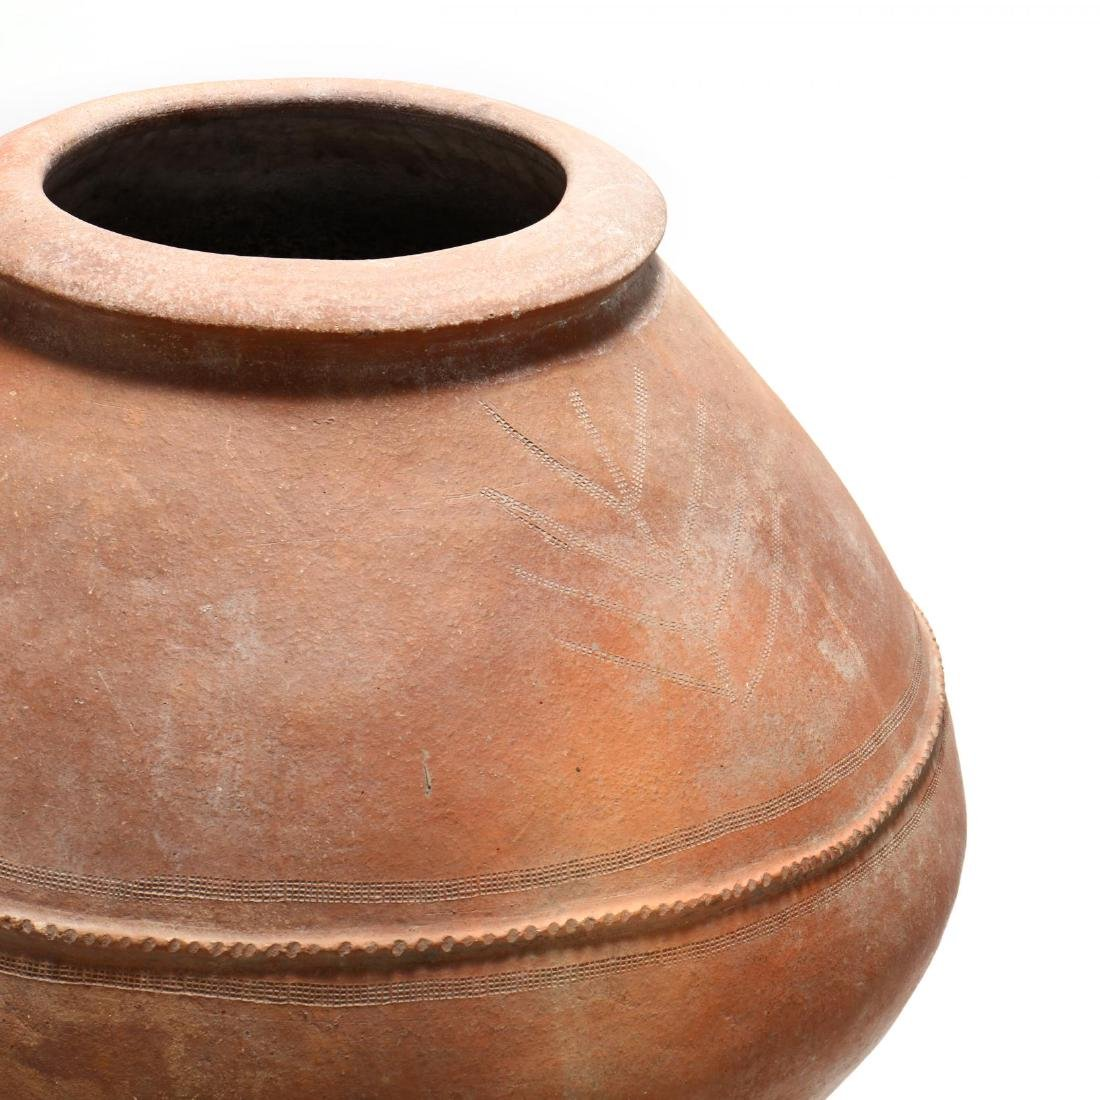 Cypriot Traditional Terracotta Storage Jar - 3